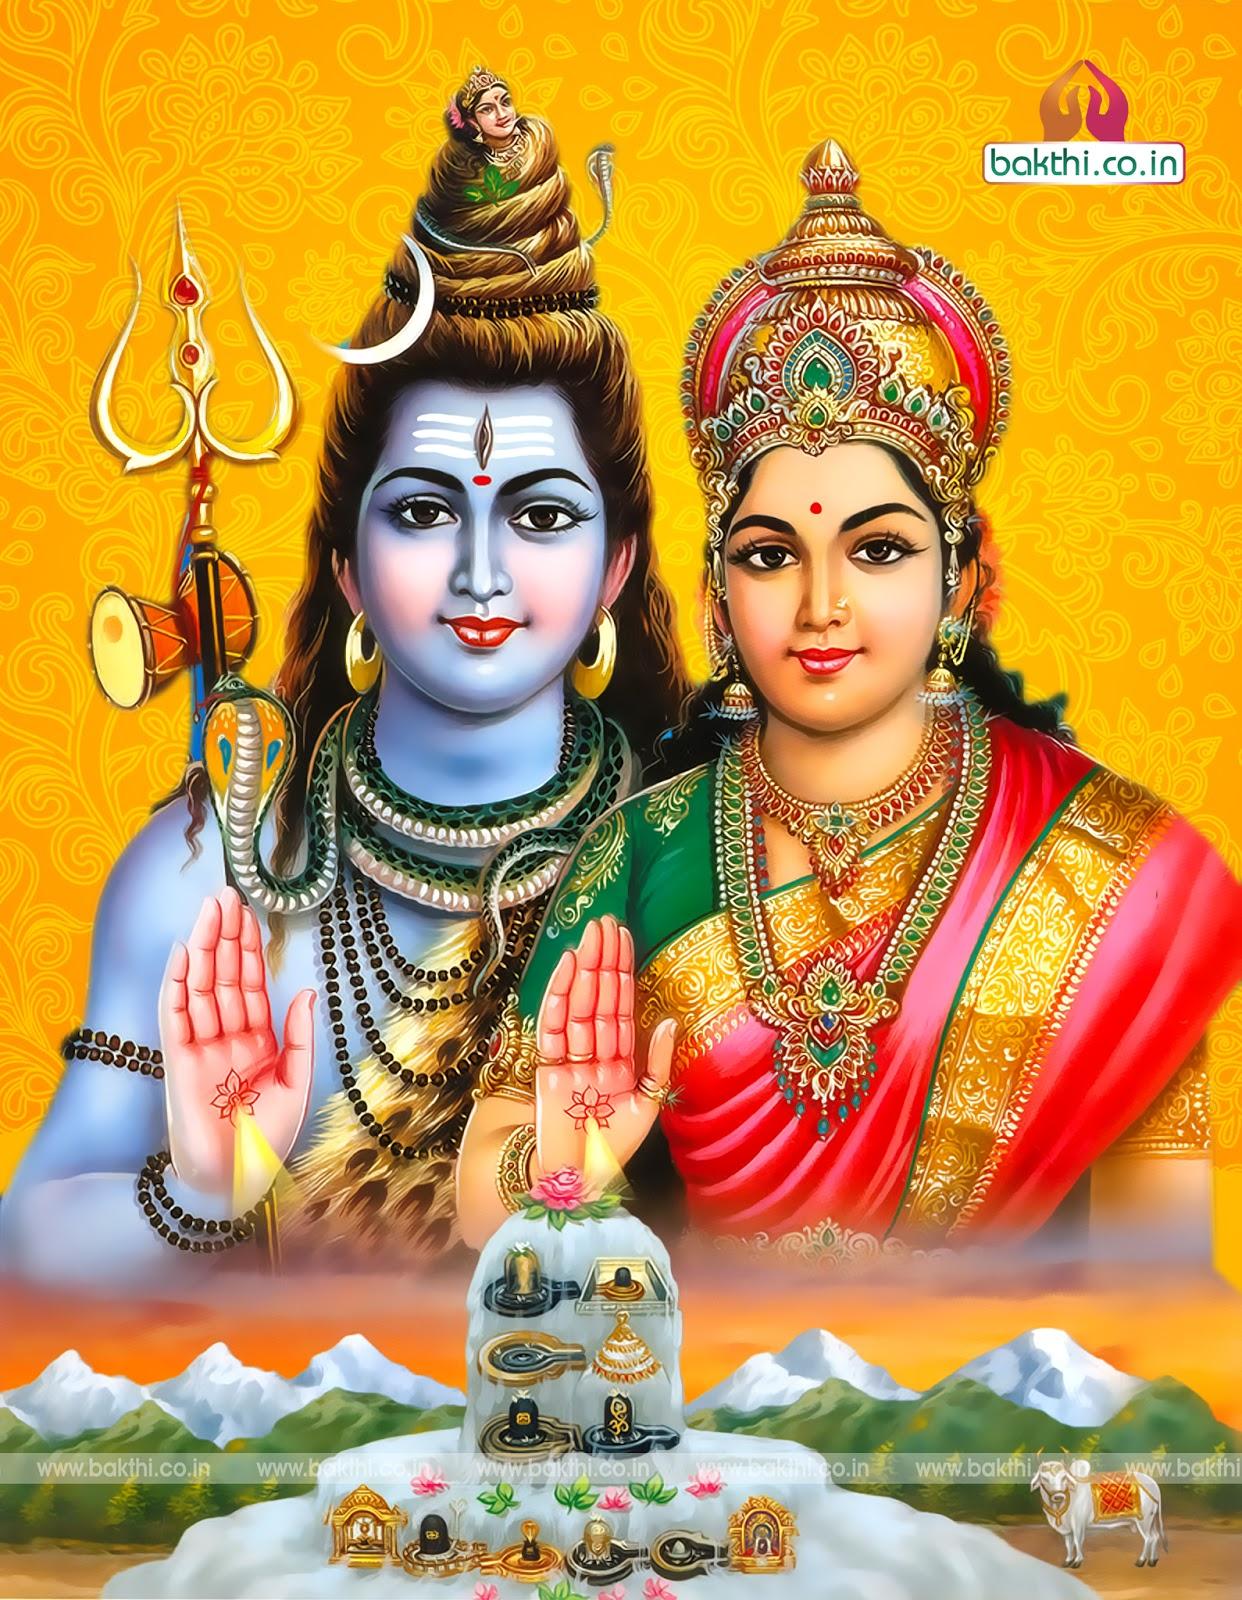 Free download hd wallpaper of lord shiva - noman name hd ...